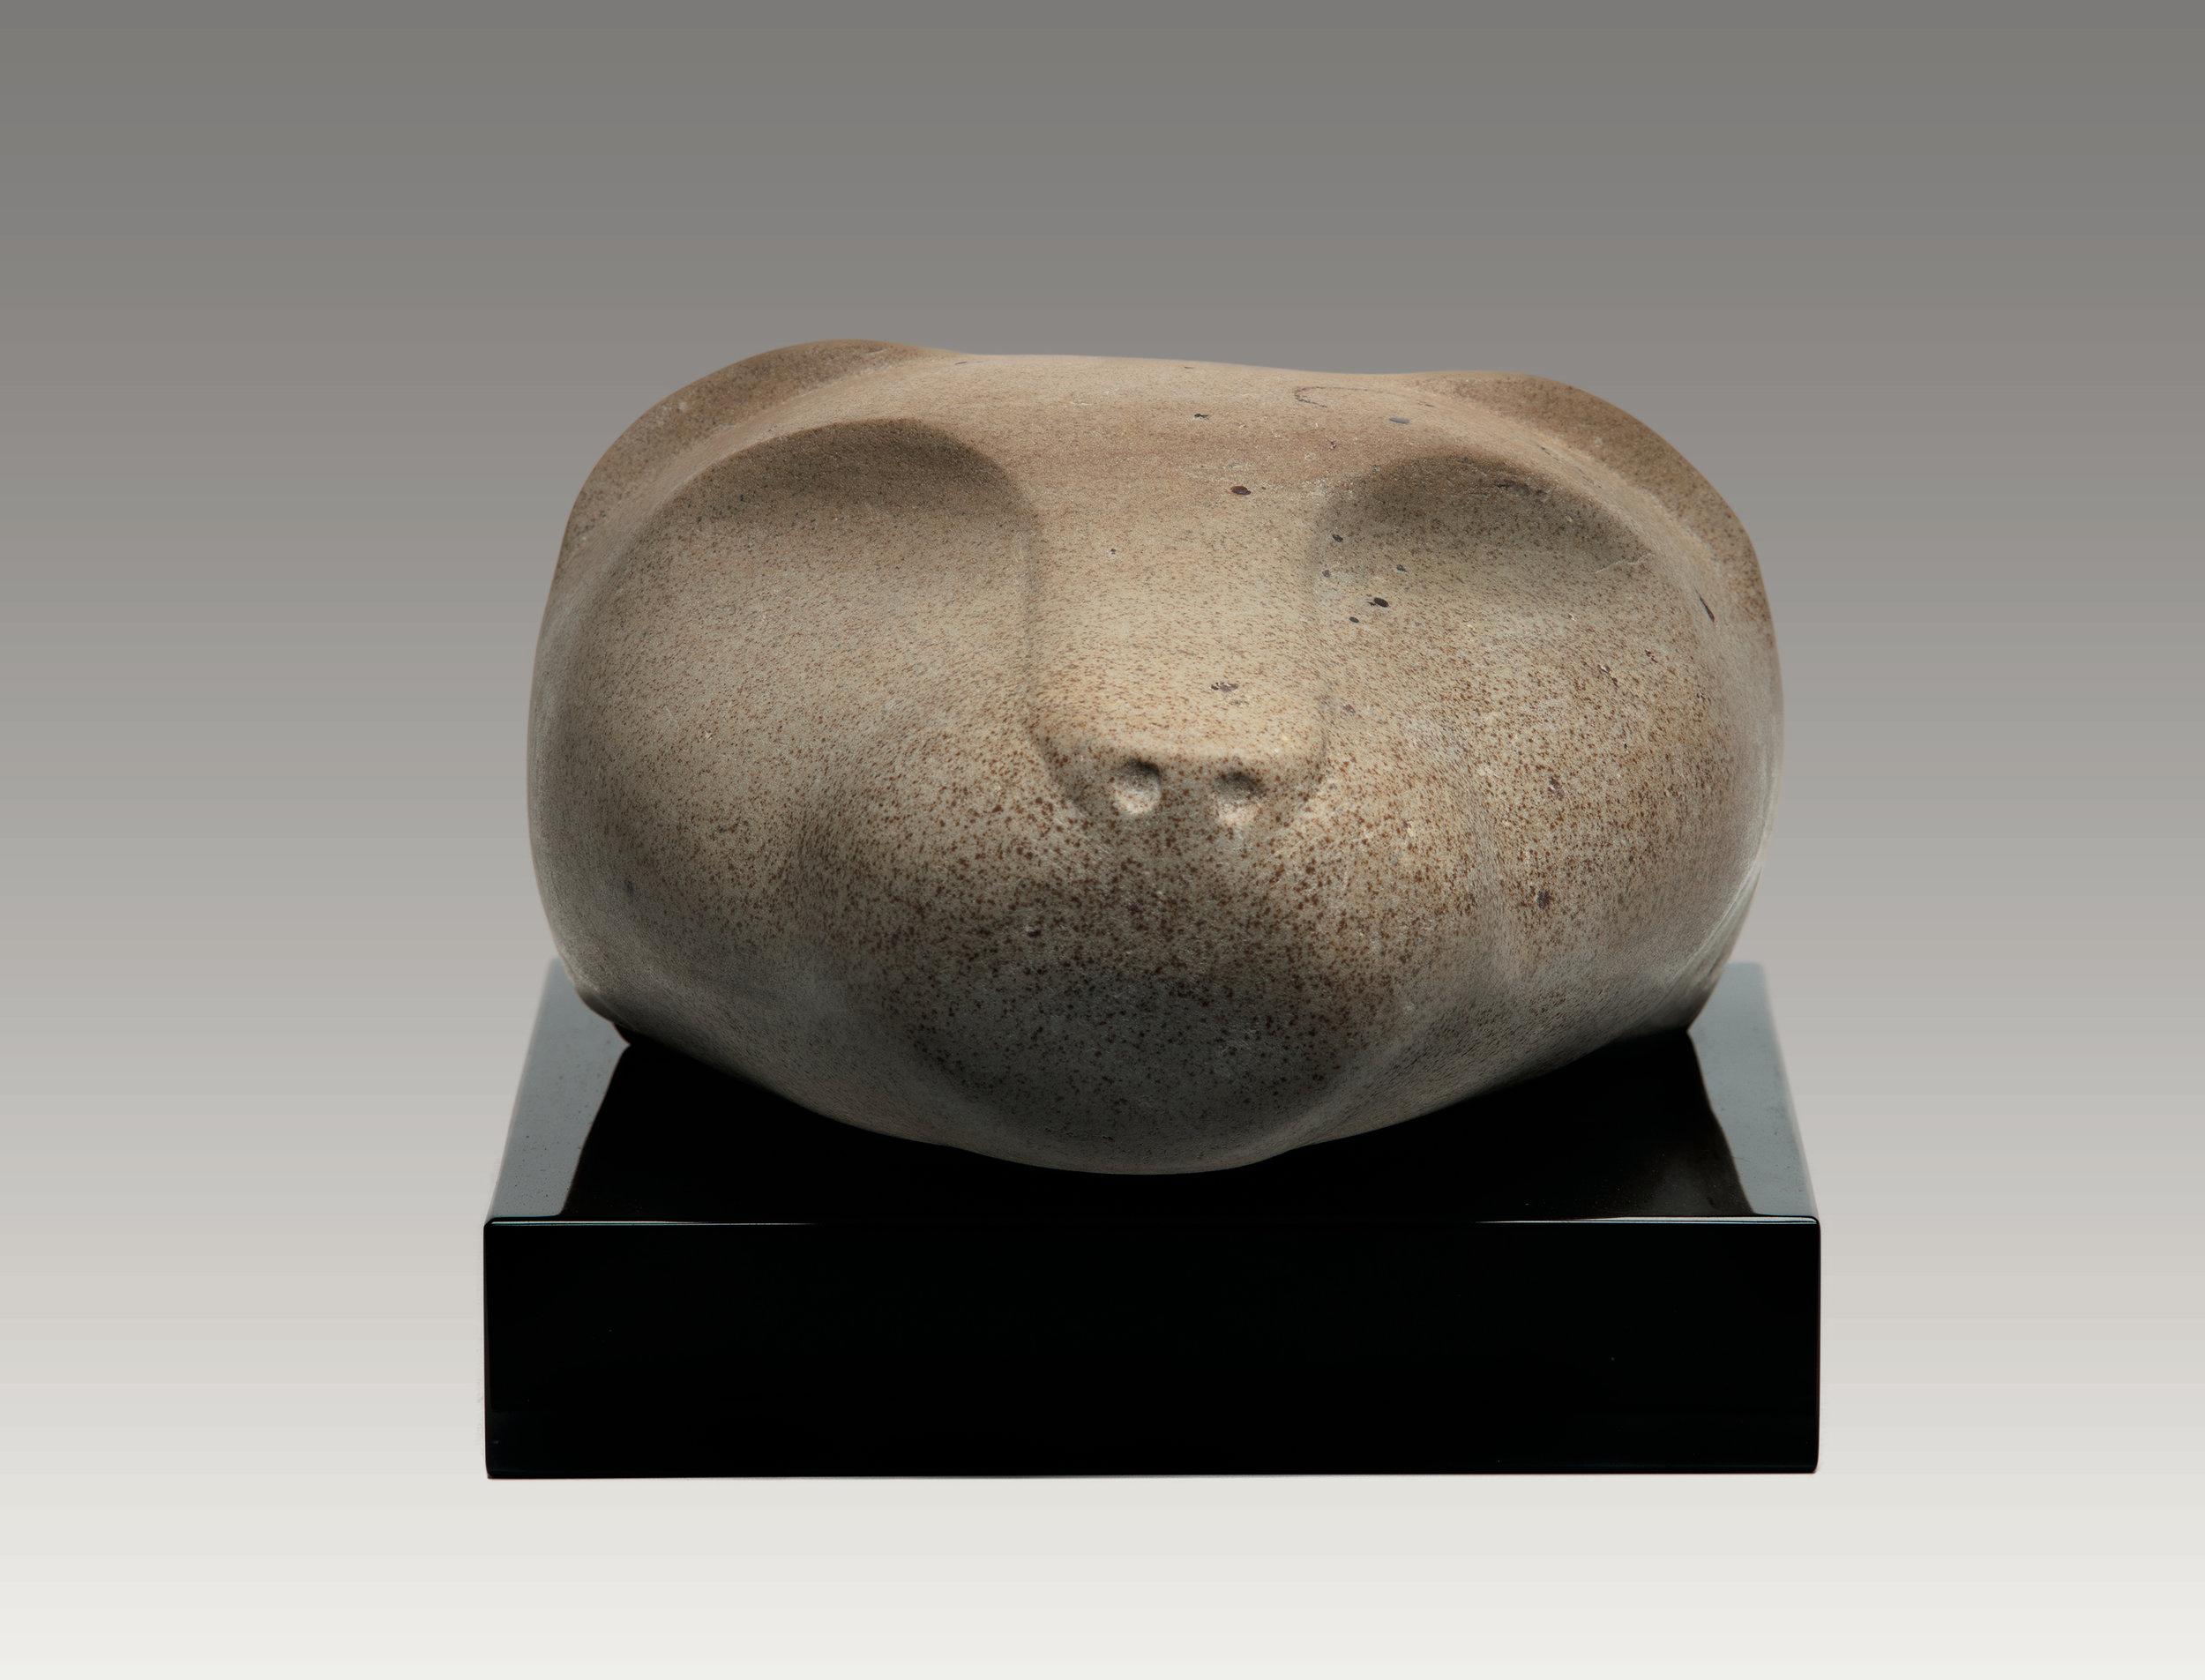 Leopard Head (sandstone) 6 x 8 x 9 inches